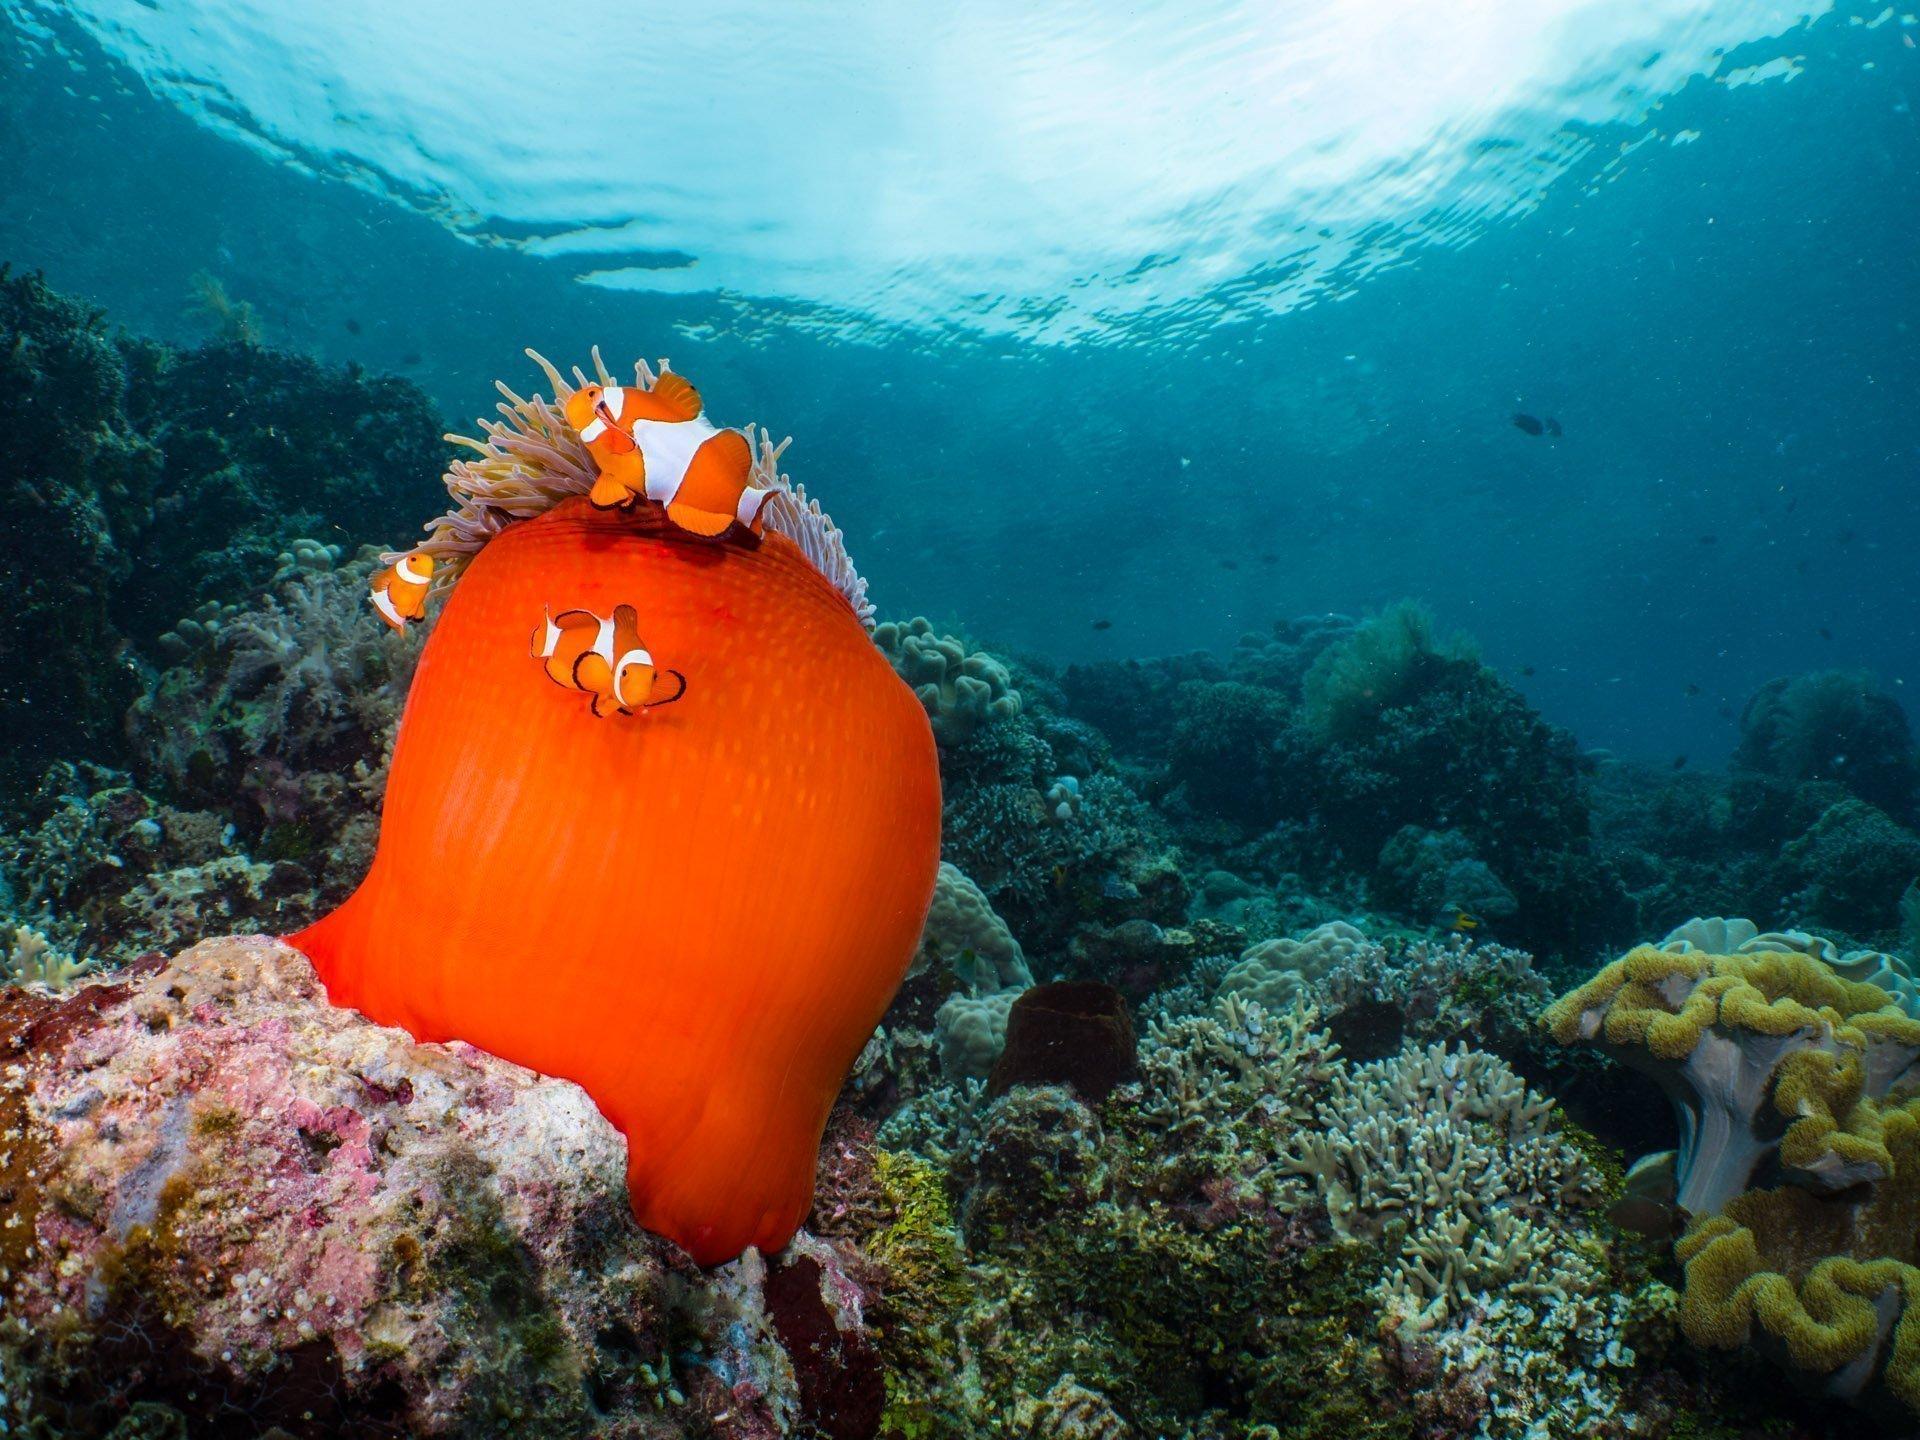 Anemone fish hiding in orange anemonie